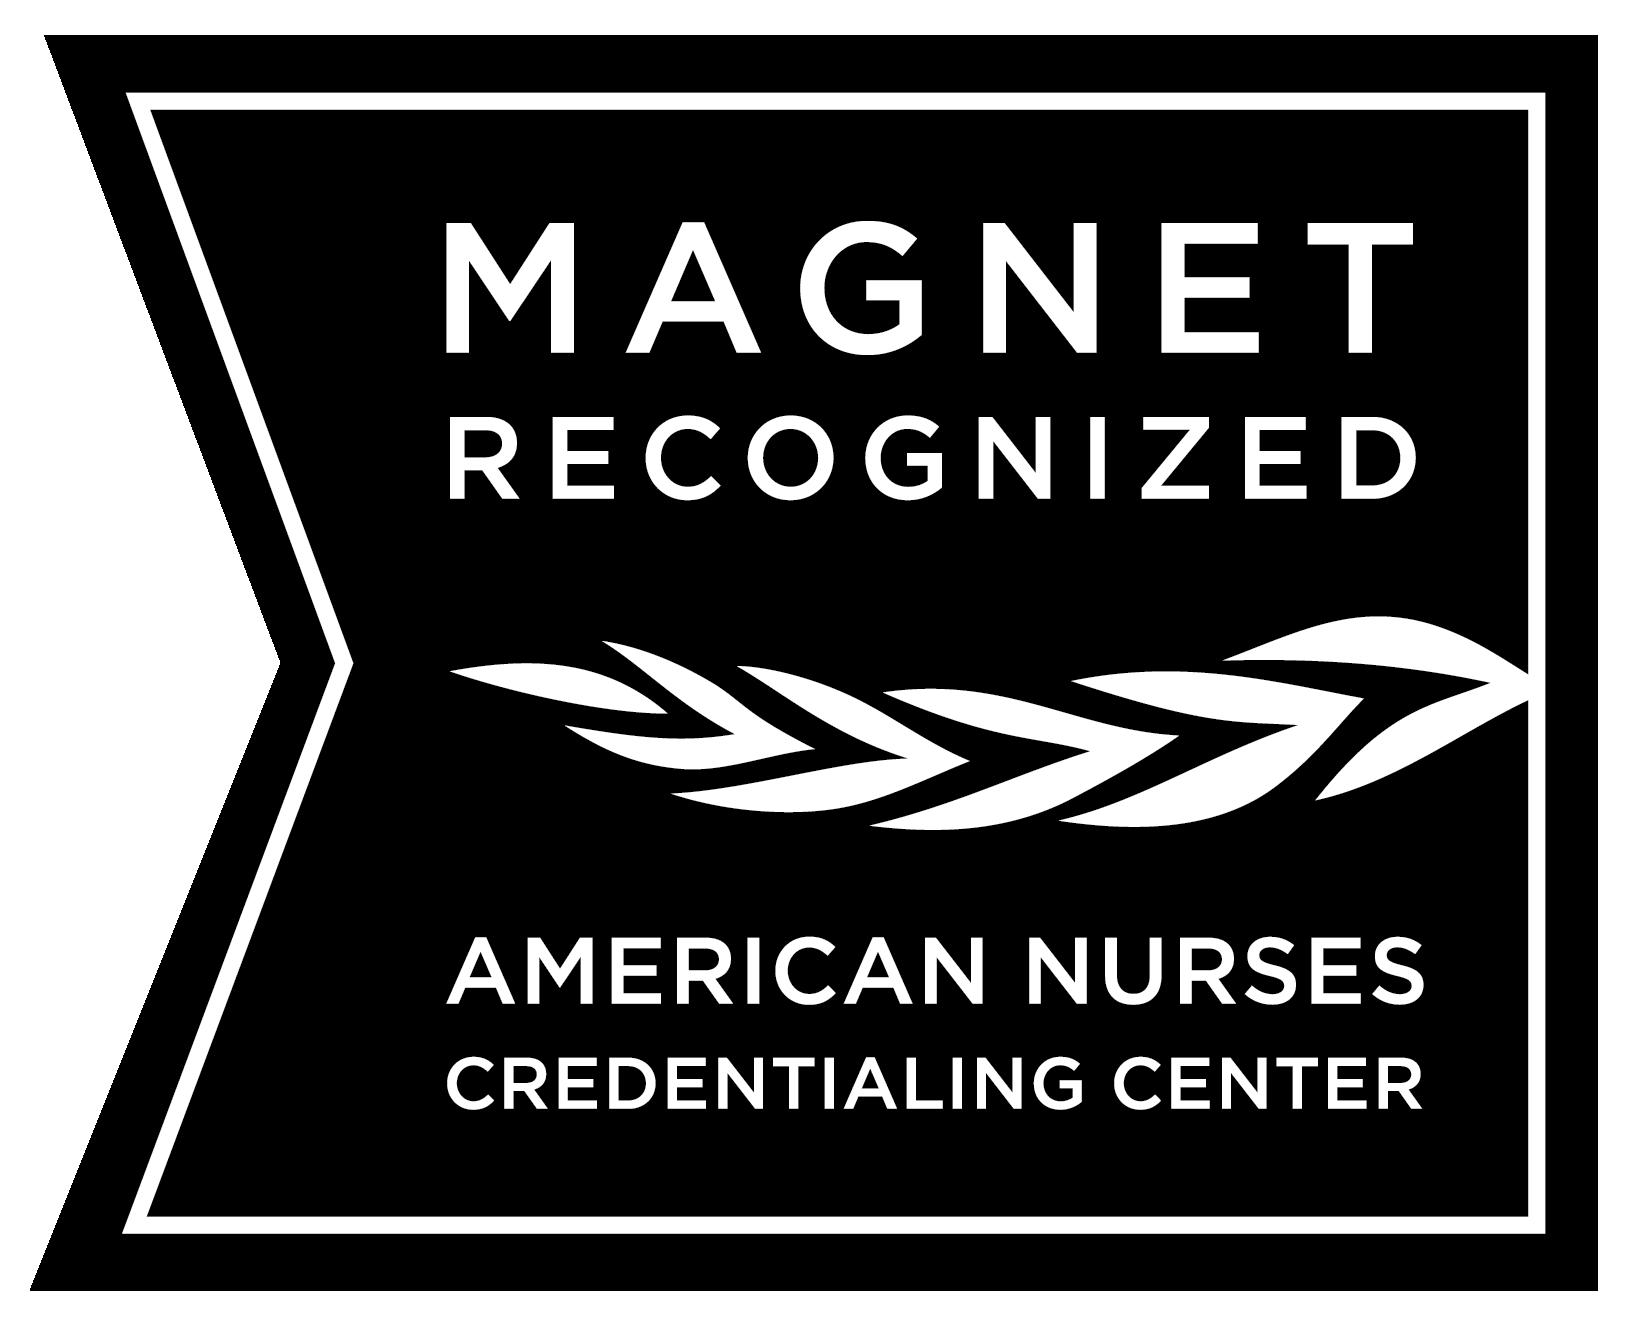 American Nurses Credentialing Center: Magnet Recognition